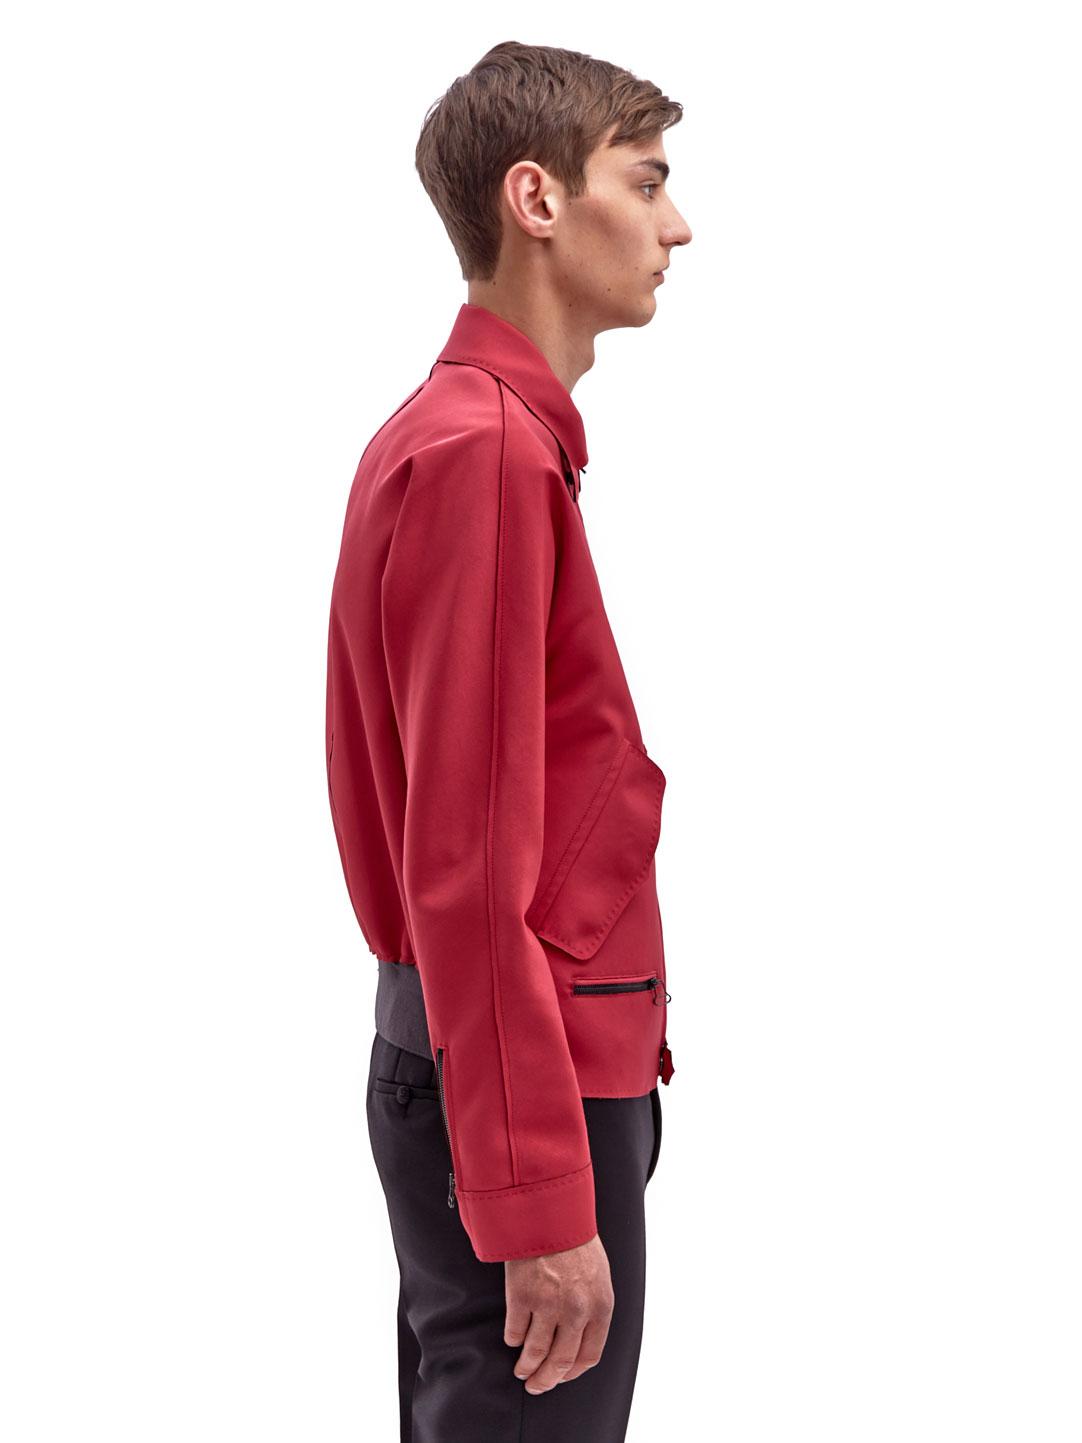 Lanvin Synthetic Mens Blouson Jacket in Red for Men